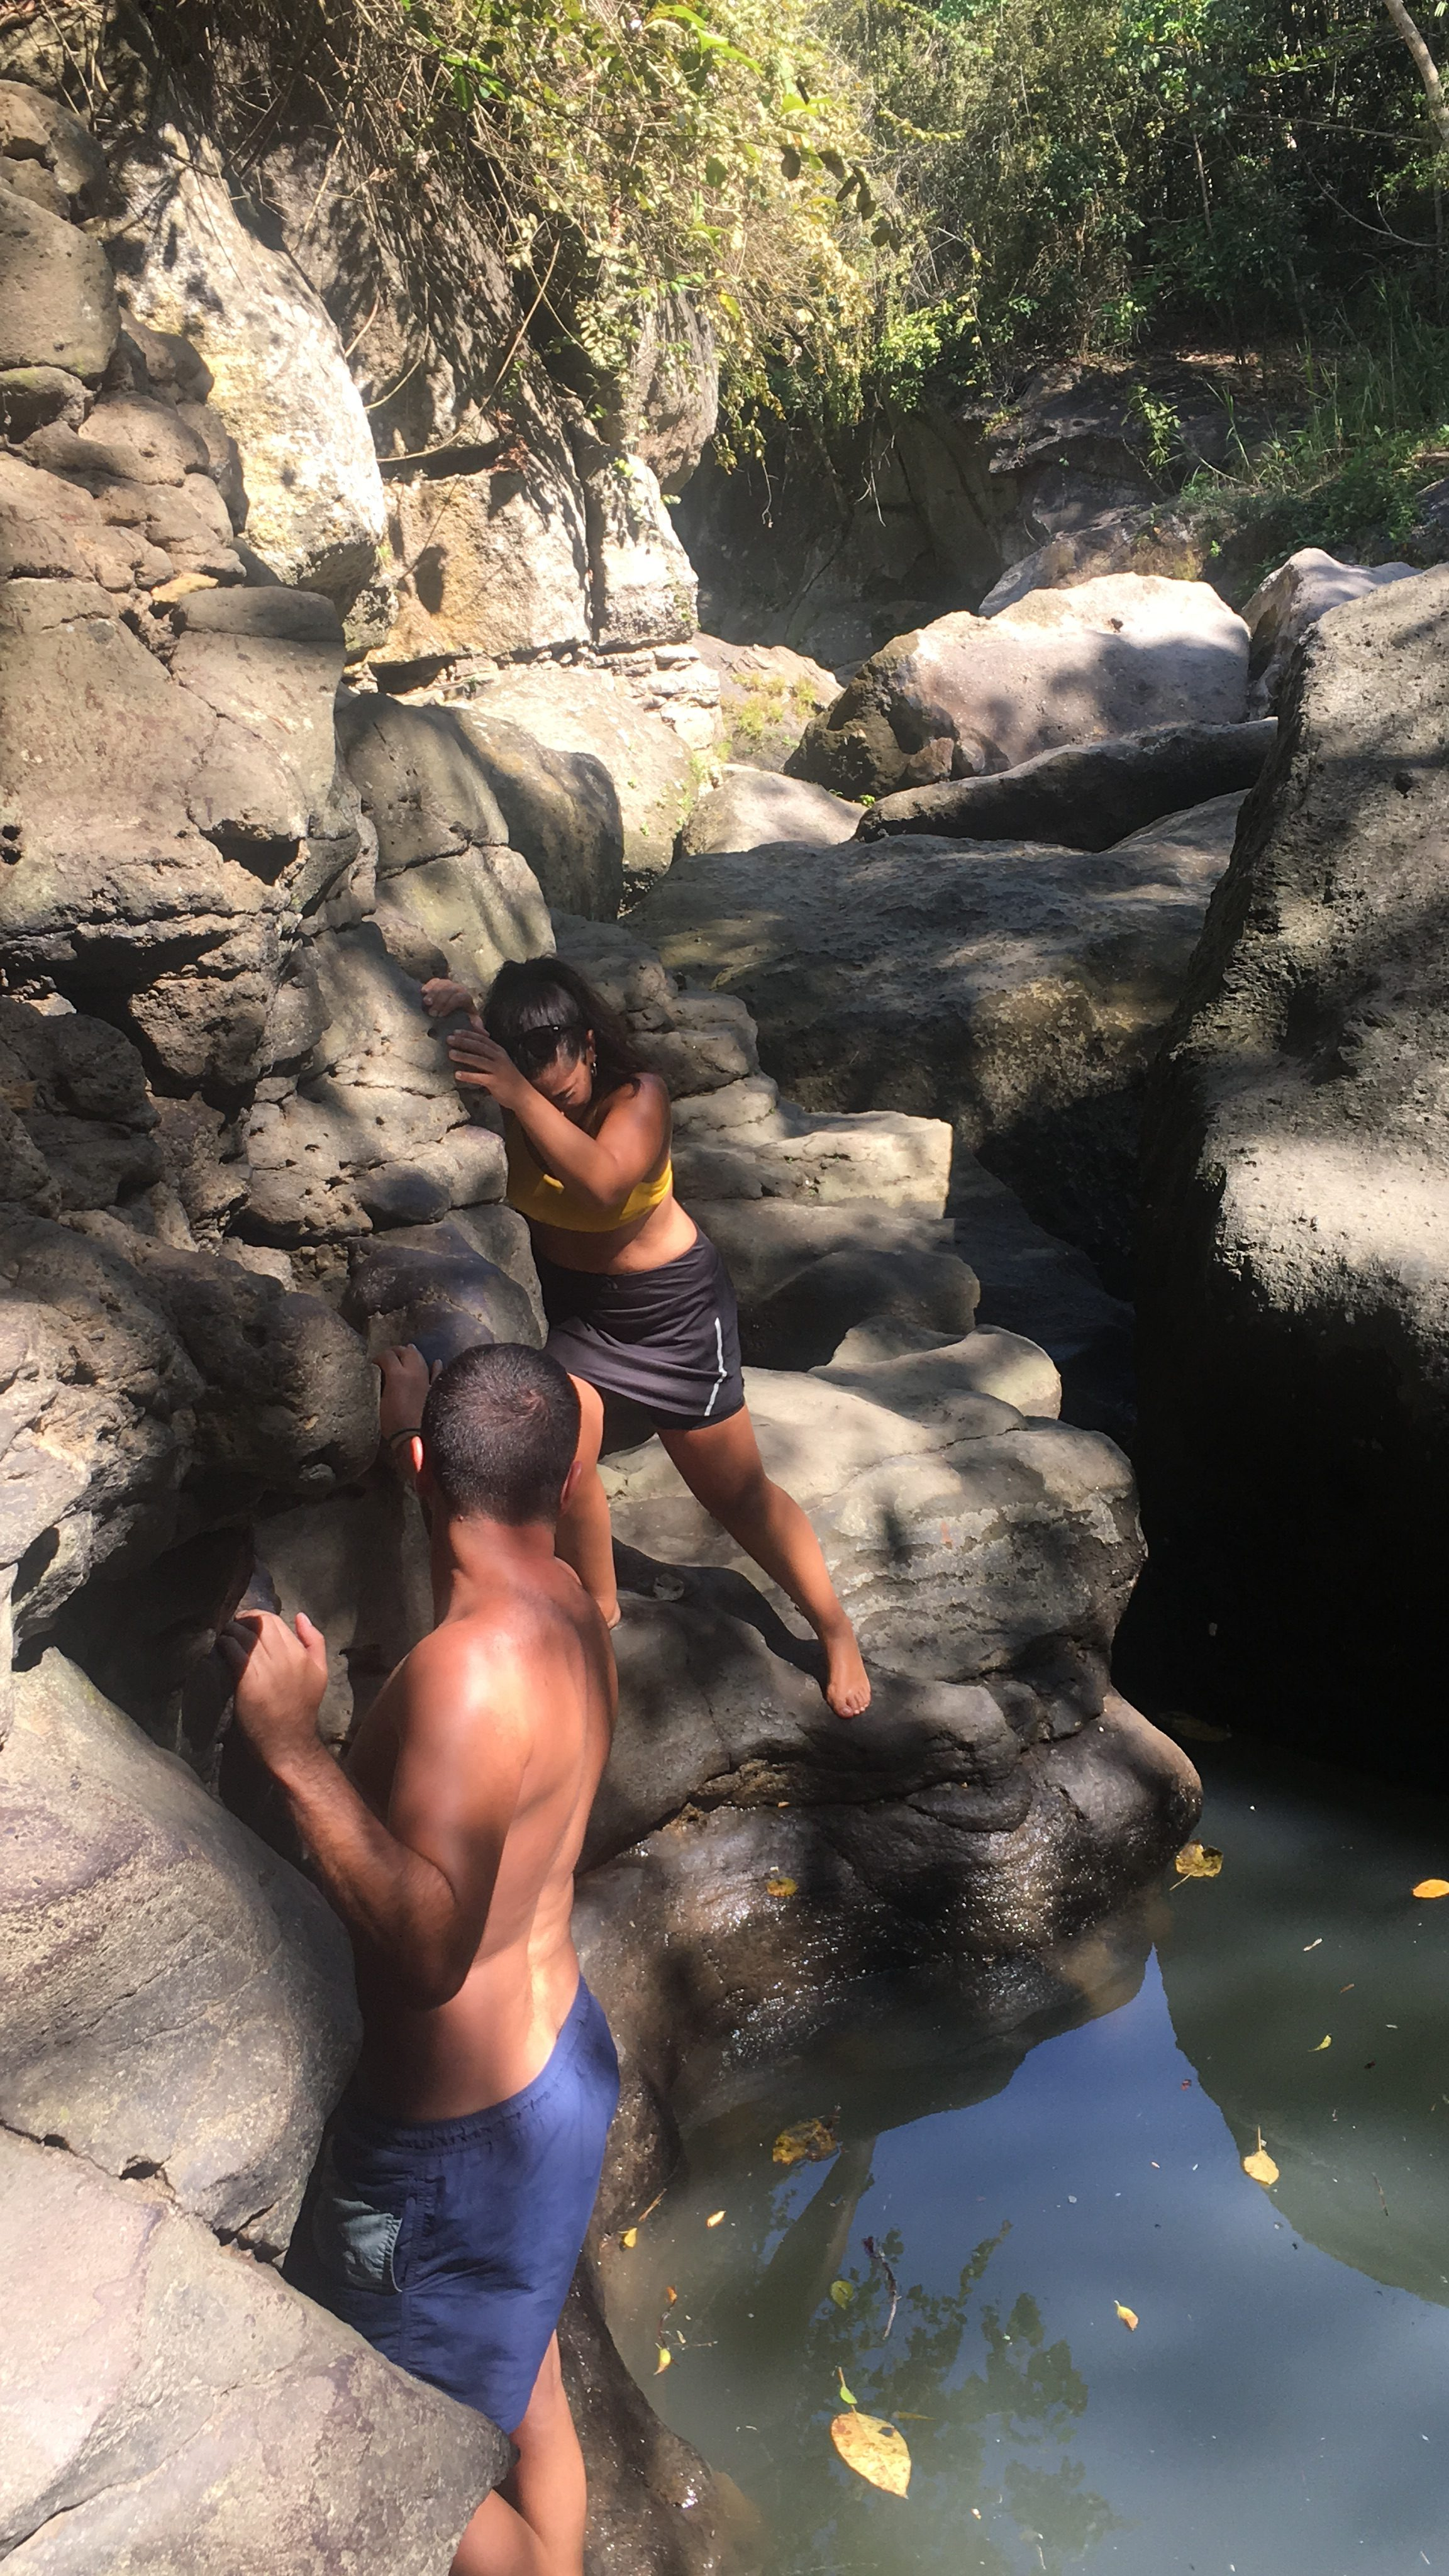 El cañón secreto de Bali (Hidden Canyon Beji Guwang)